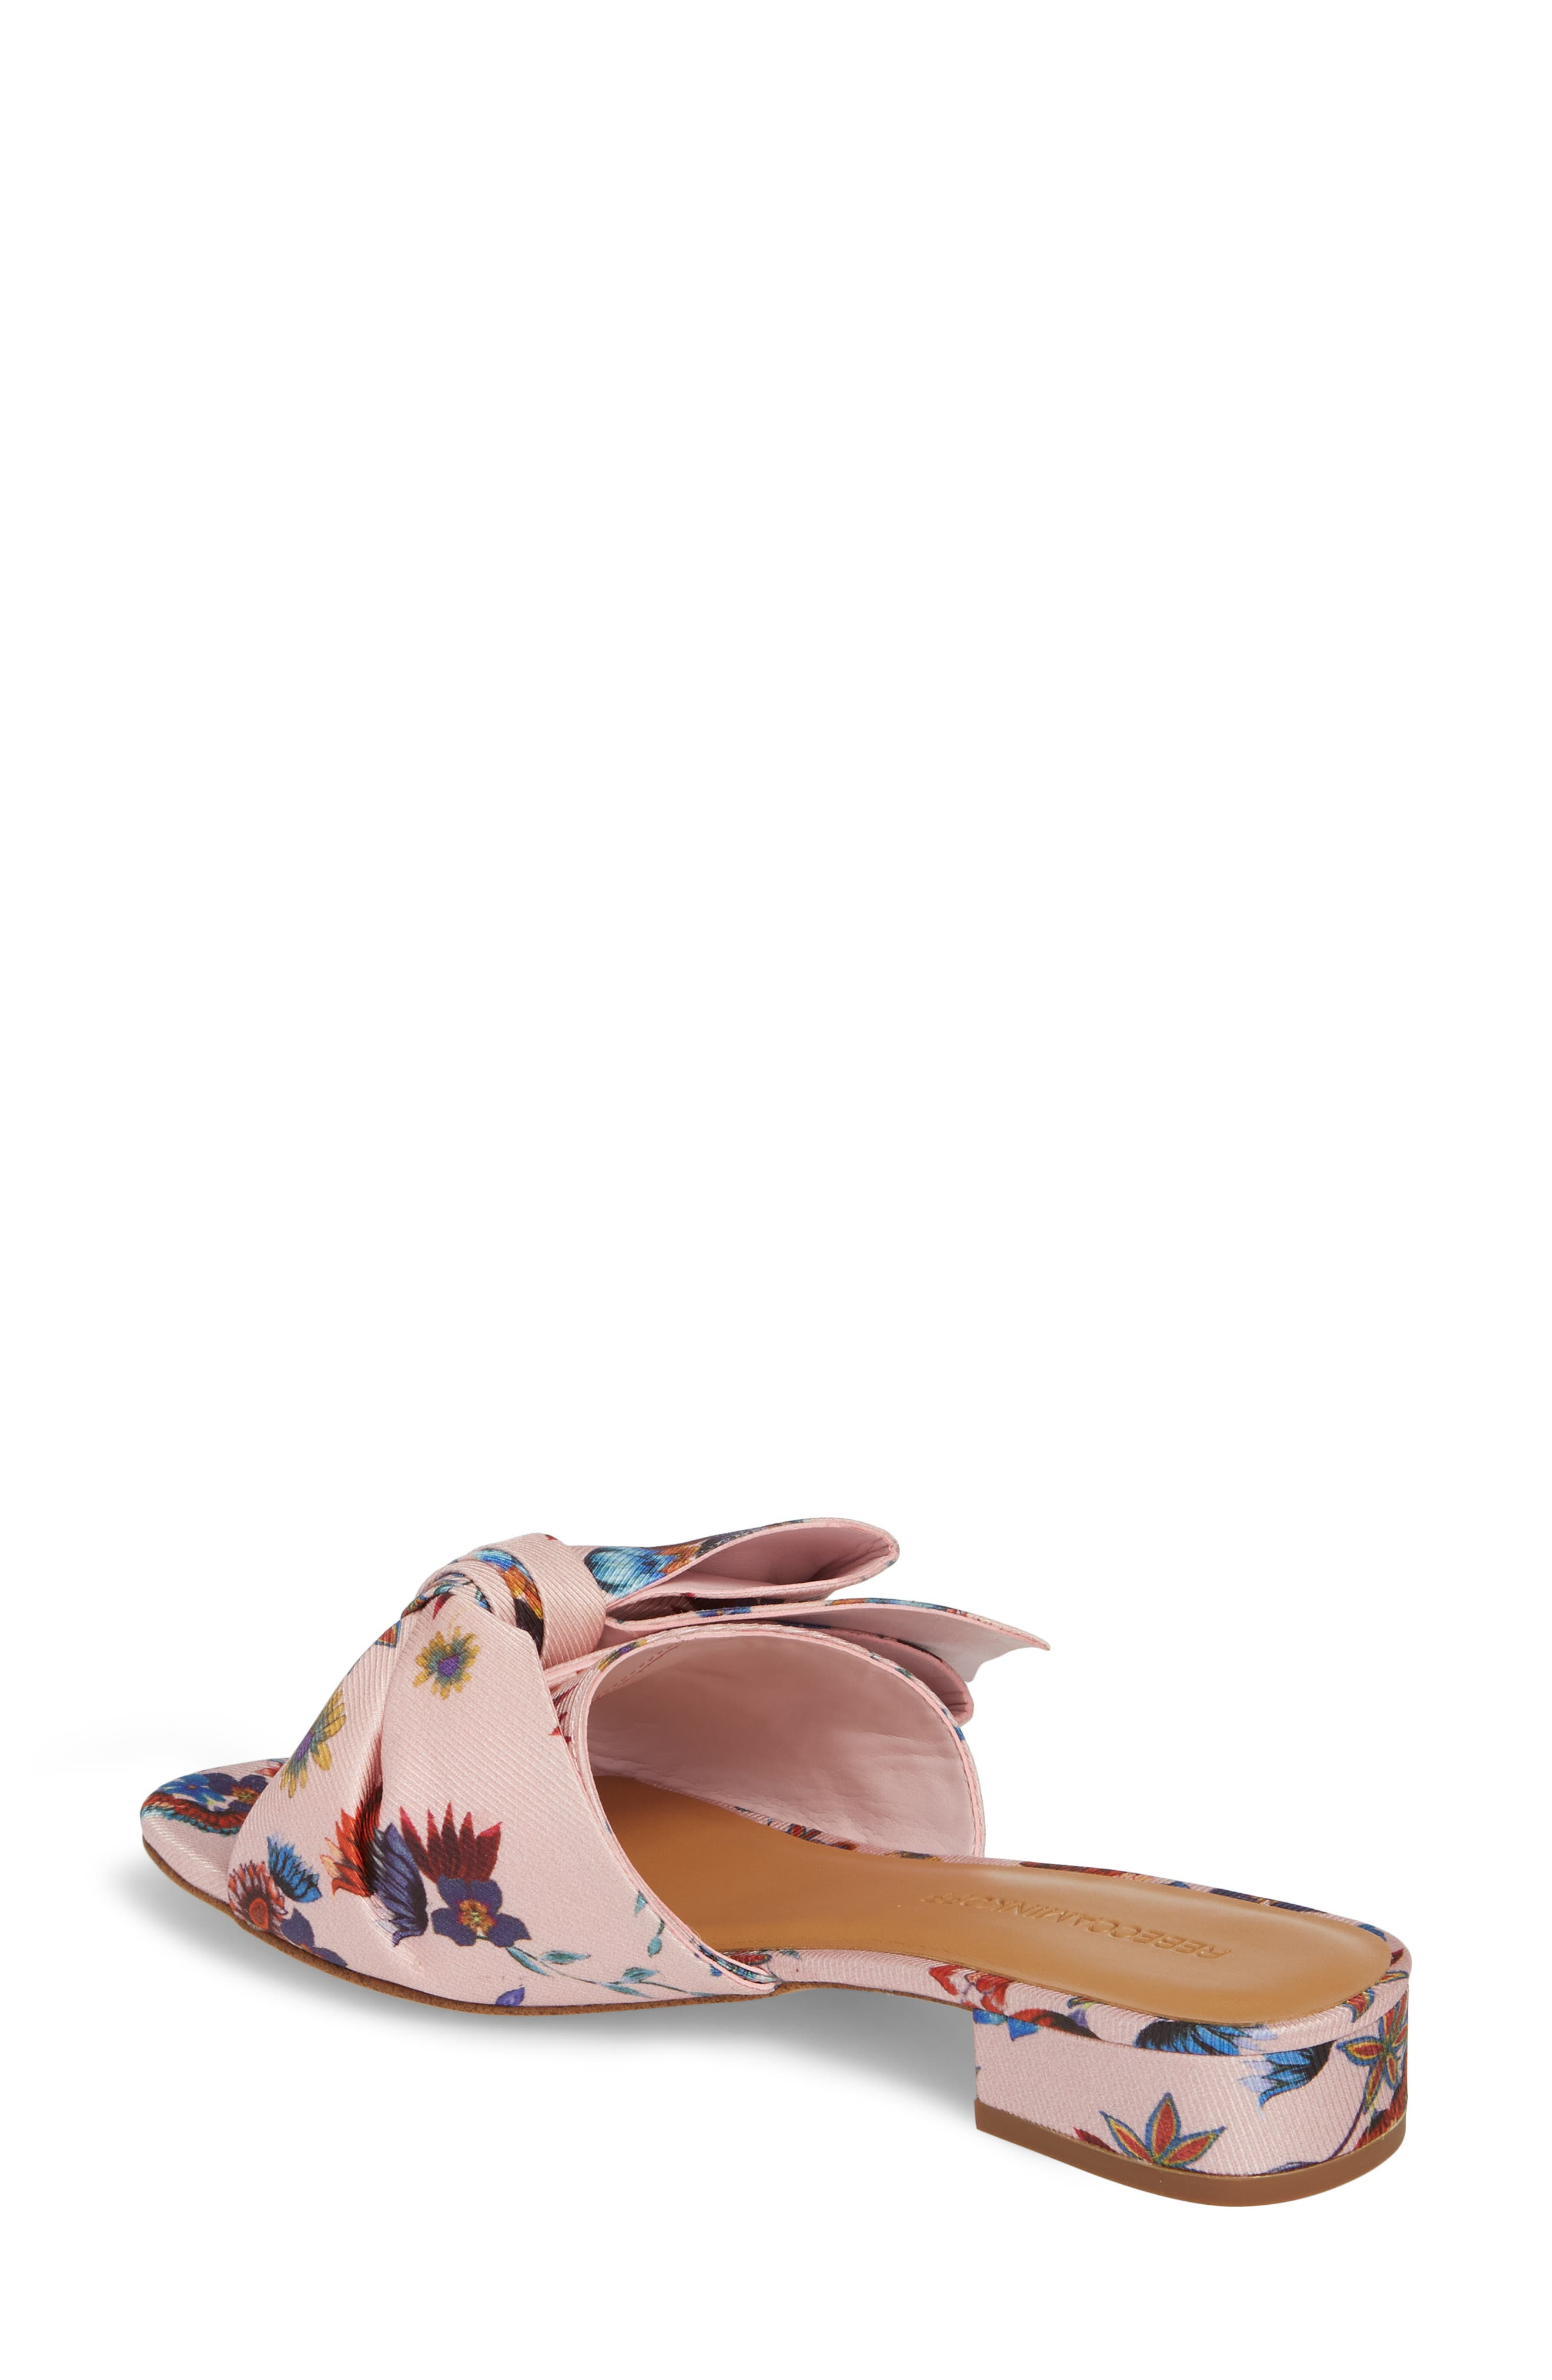 Calista Slide Sandal,                             Alternate thumbnail 2, color,                             Millennial Pink Multi Fabric